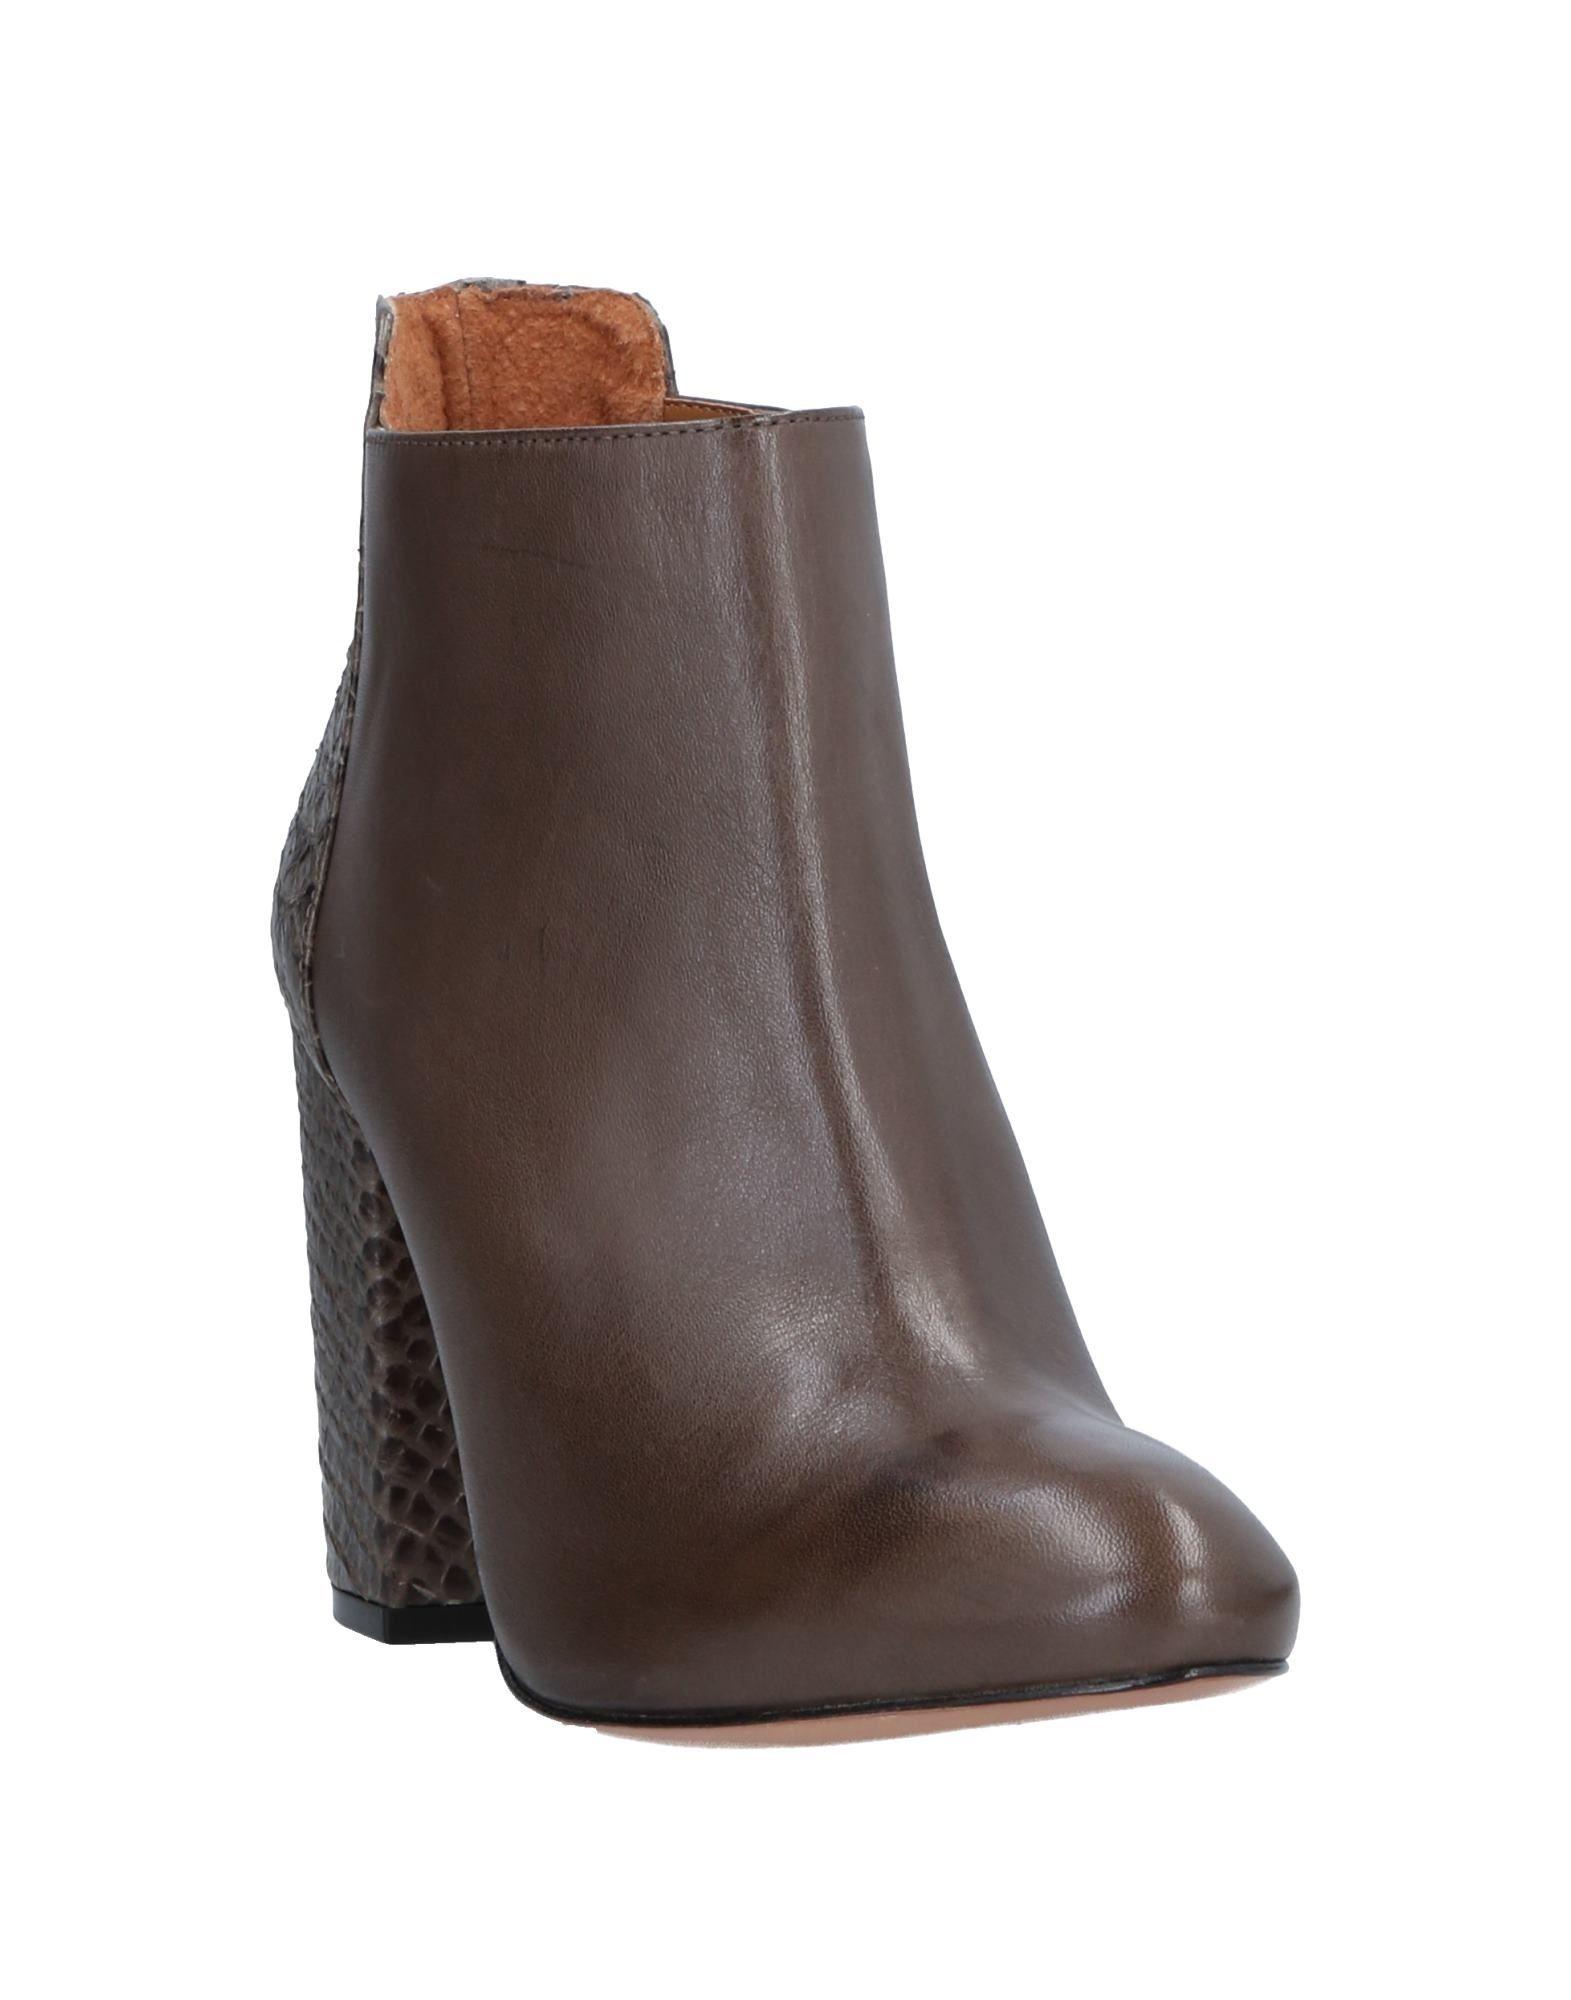 Panella Stiefelette Damen 11526694QP  11526694QP Damen Gute Qualität beliebte Schuhe b31275